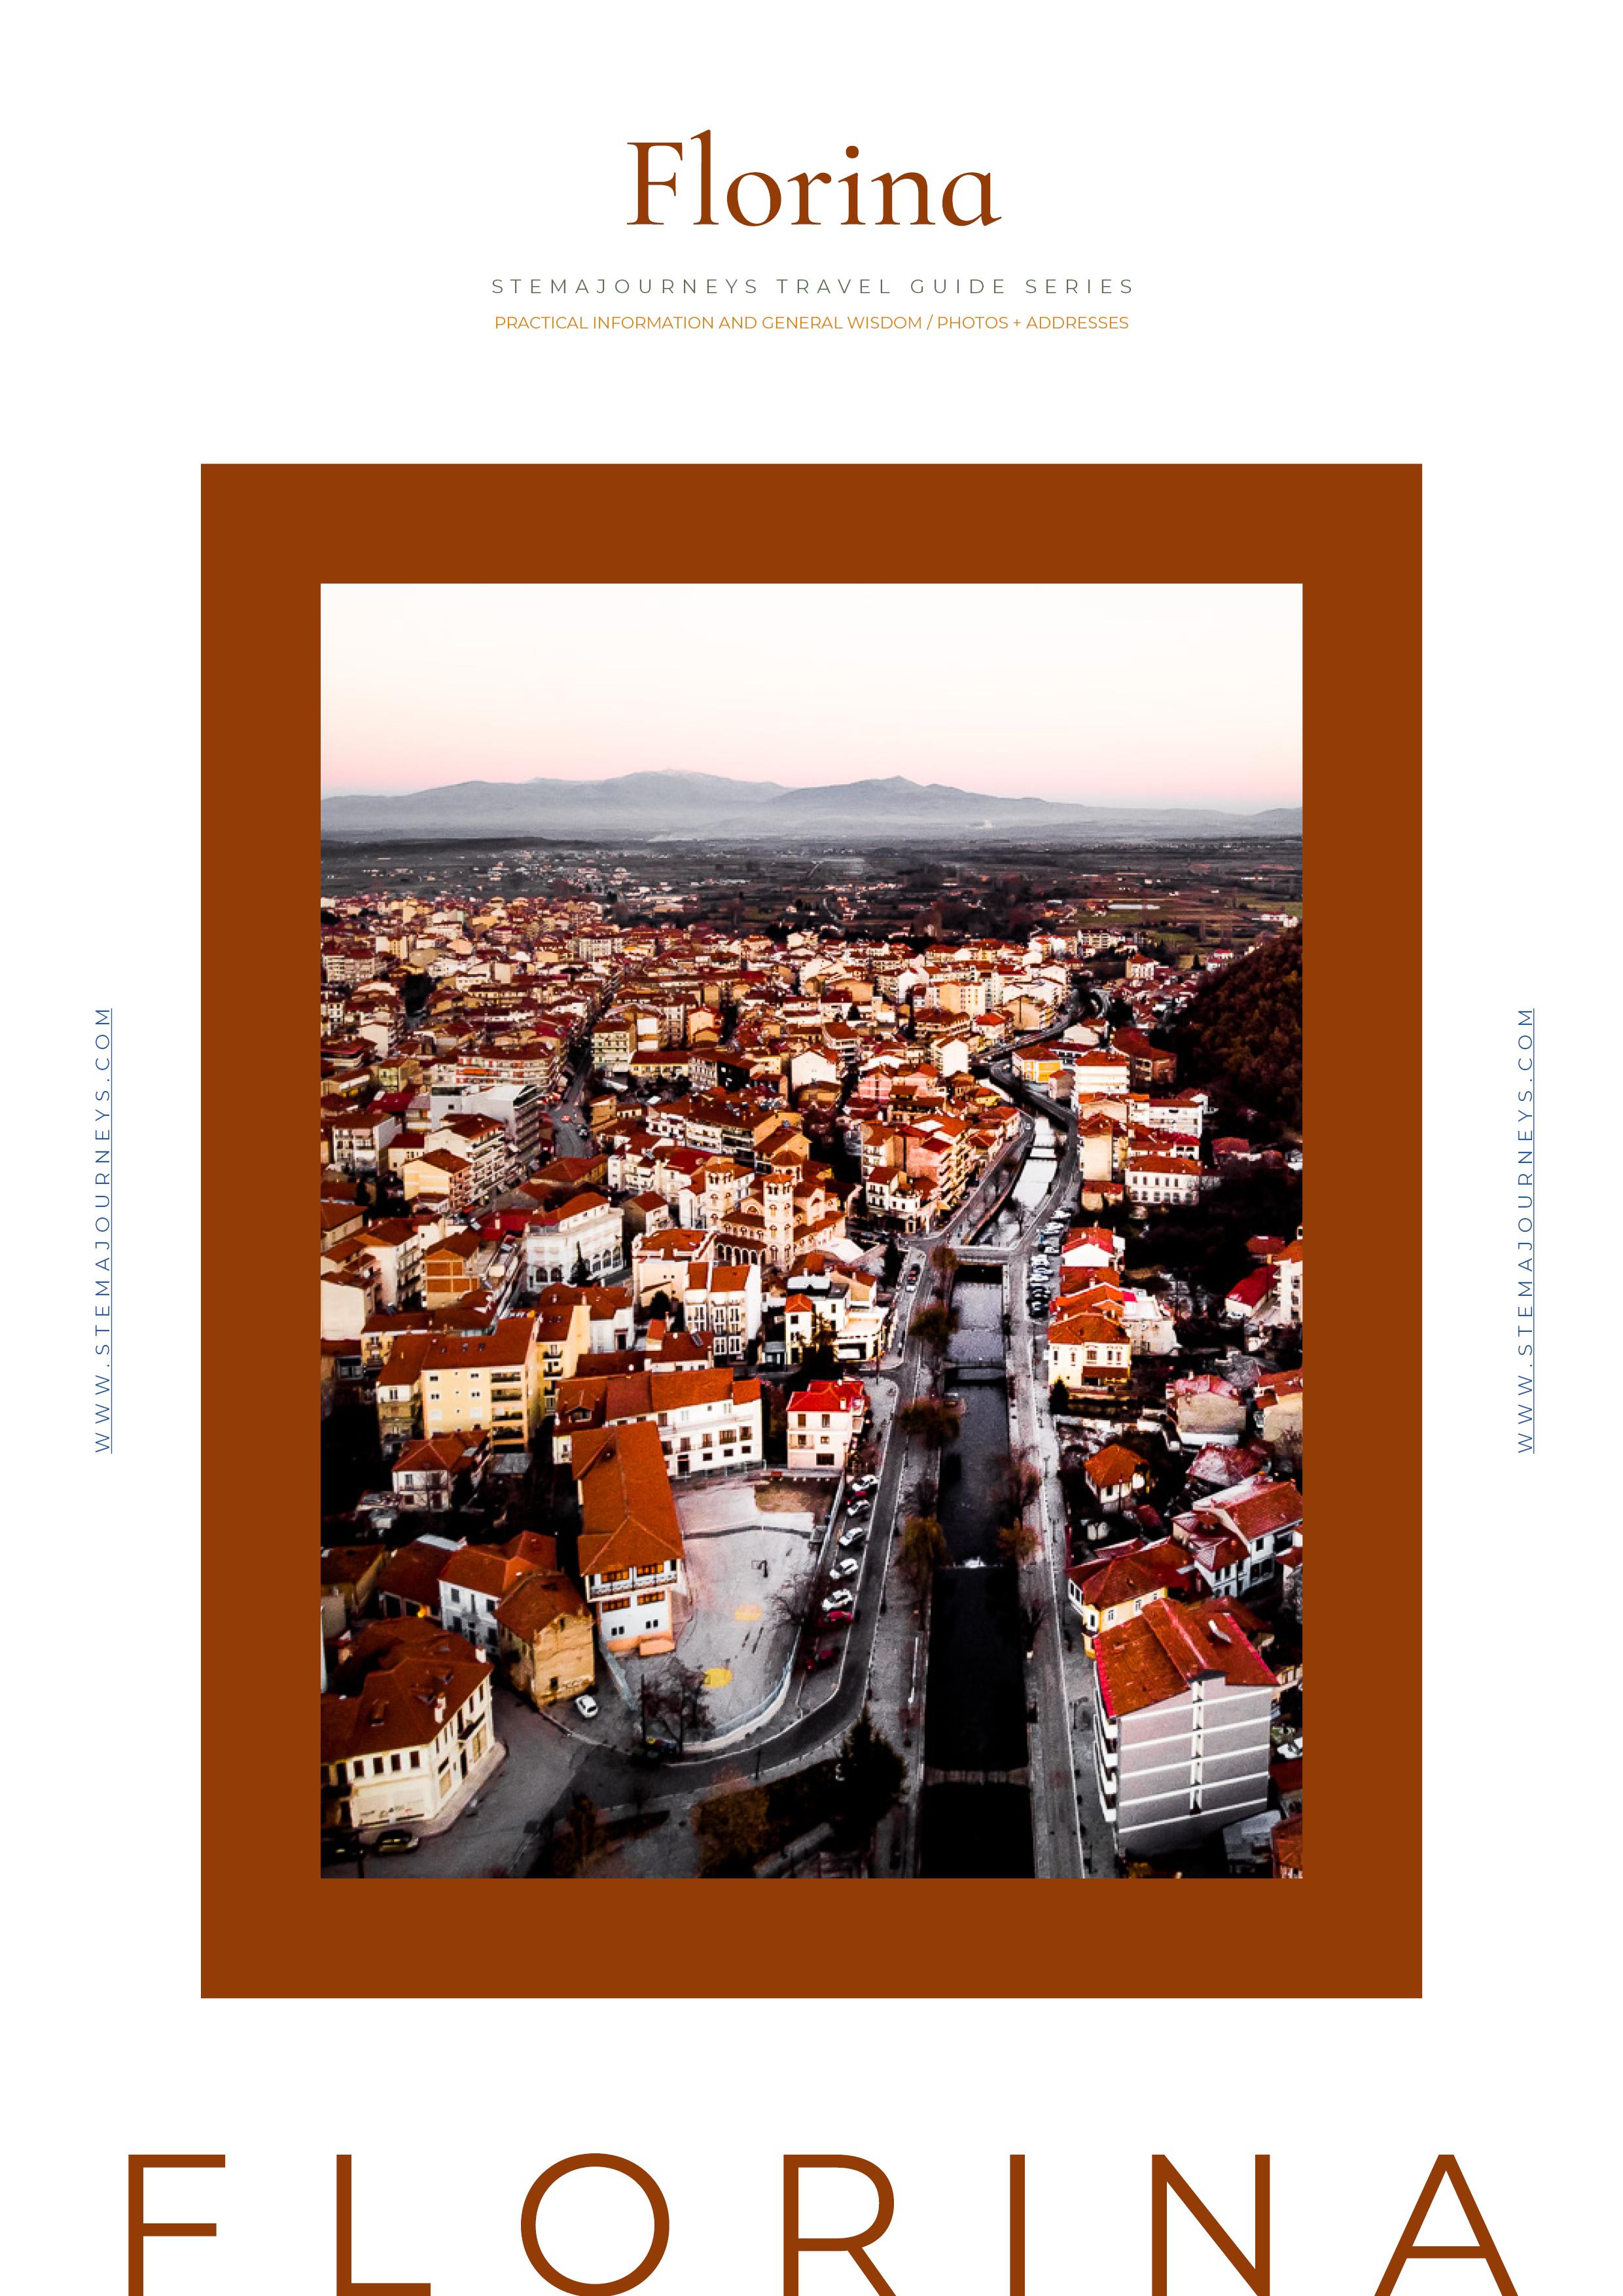 Florina guide.jpg